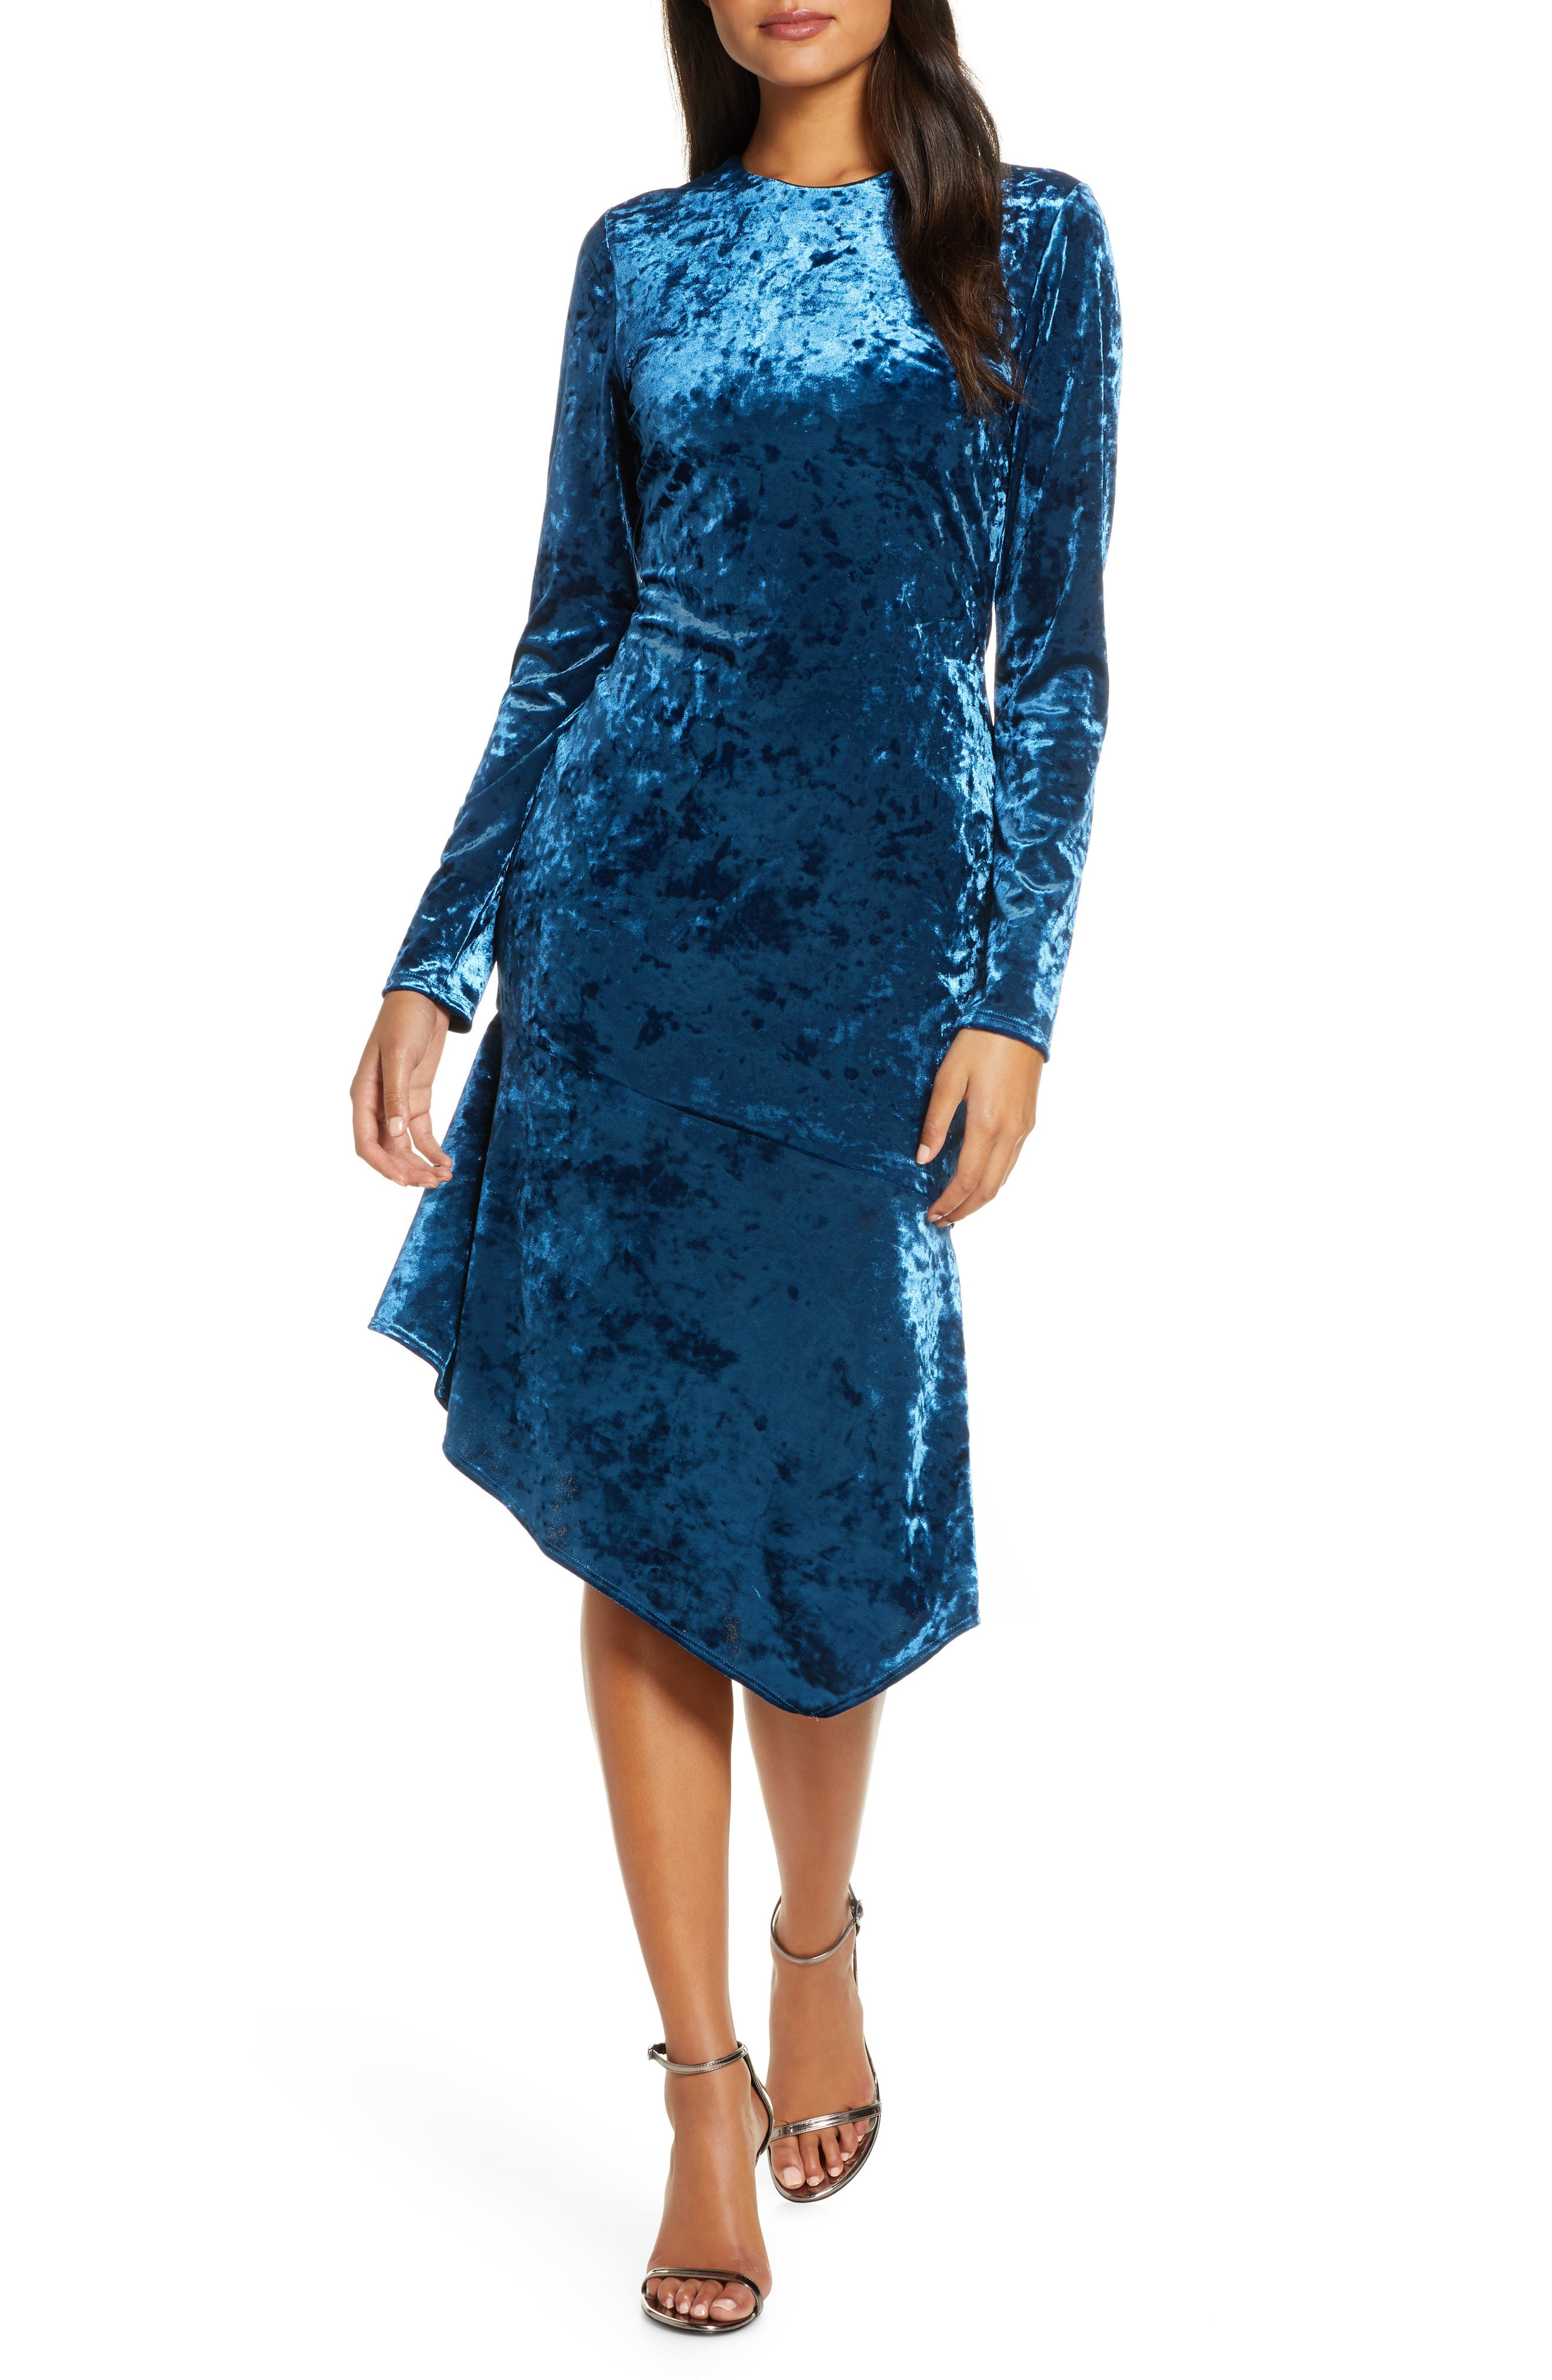 Vintage 1920s Dresses – Where to Buy Womens Black Halo Maddox Velvet Sheath Dress $375.00 AT vintagedancer.com